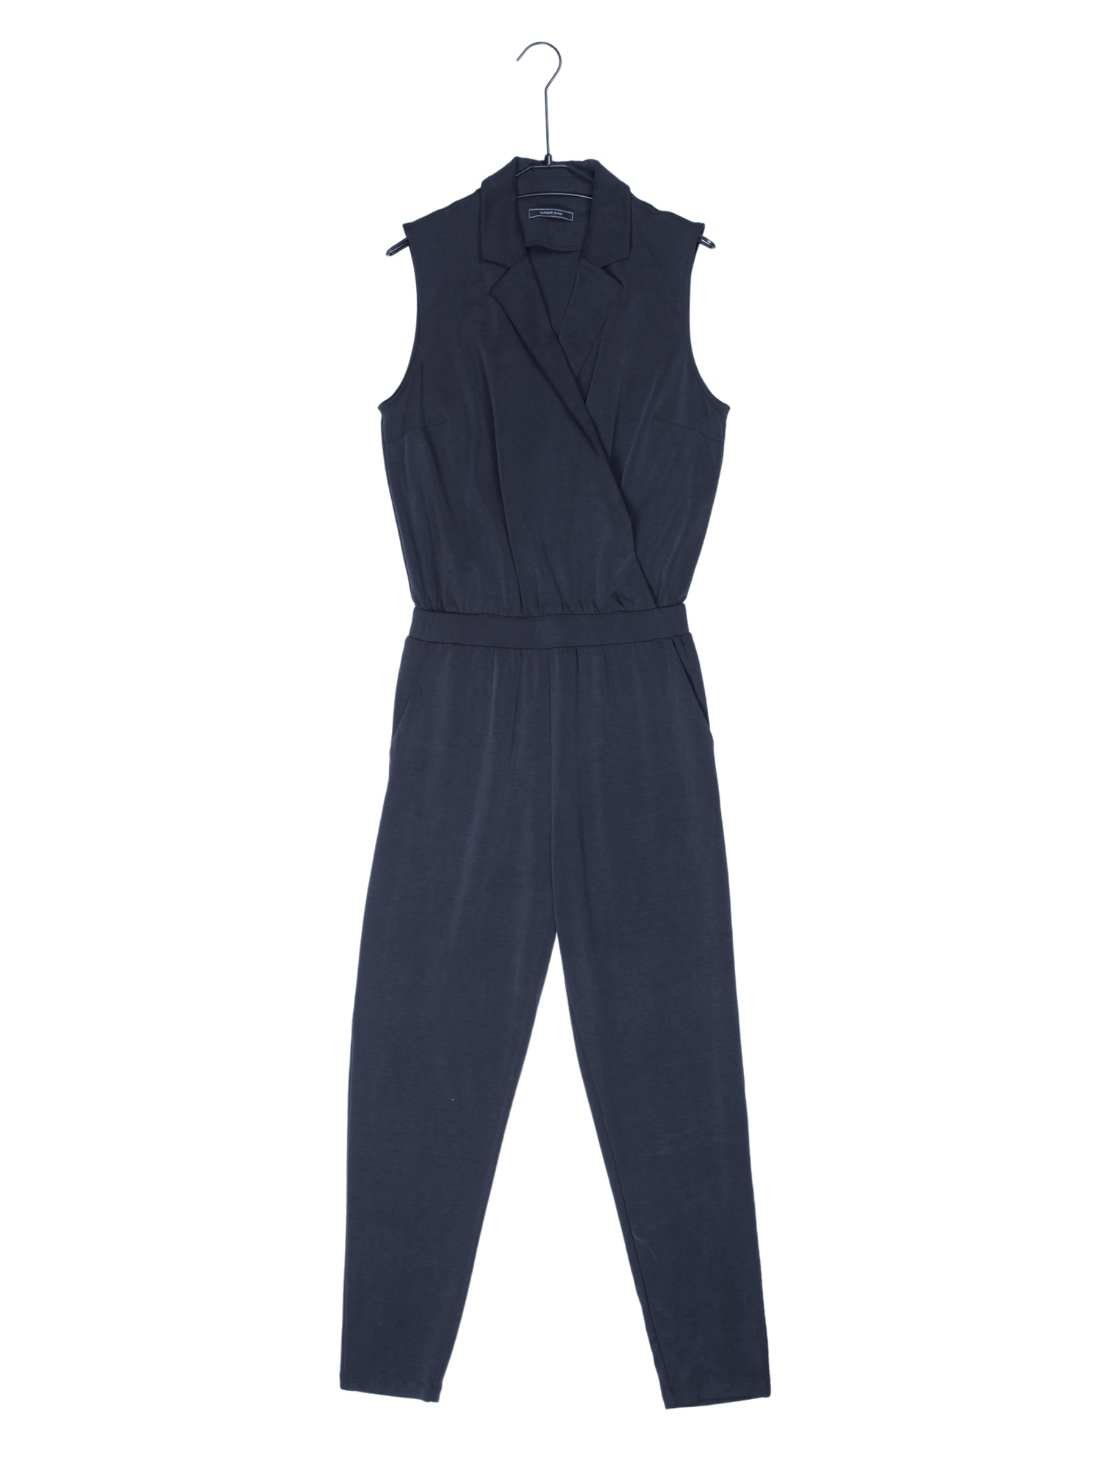 Ladies Knitting Modal Sand Washing Suit Top Jumpsuit